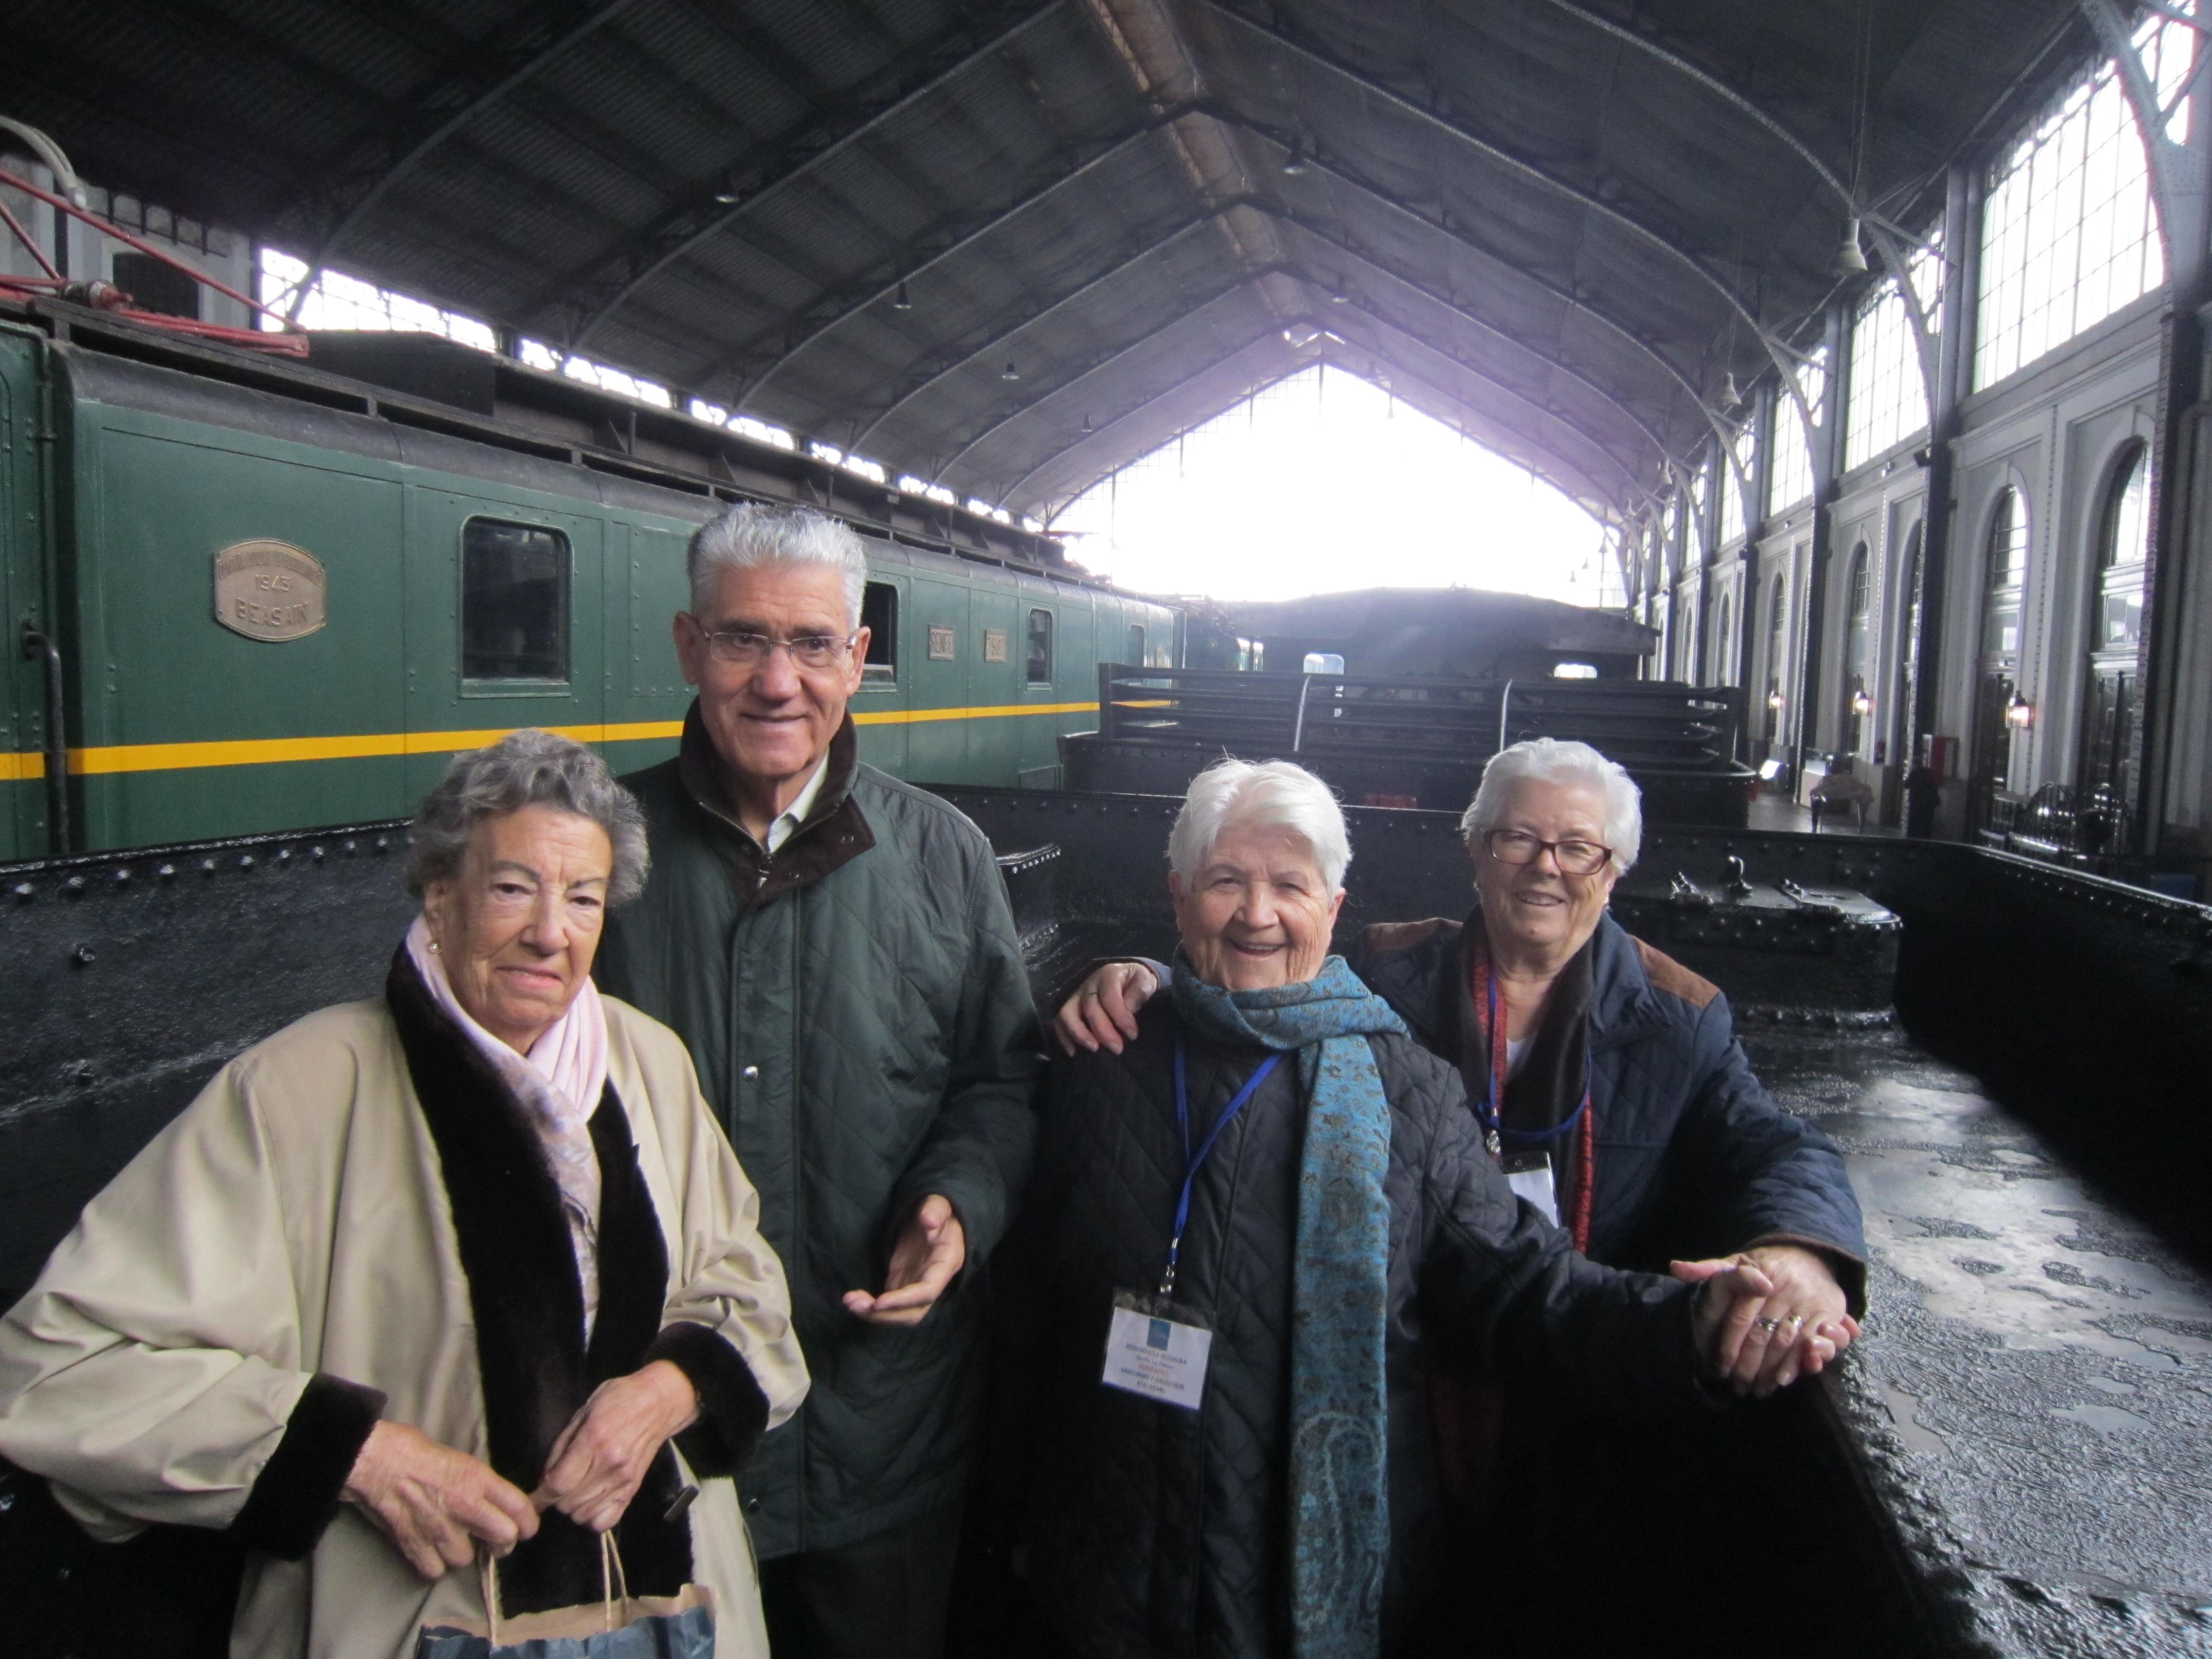 Visita al Museo del Ferrocarril